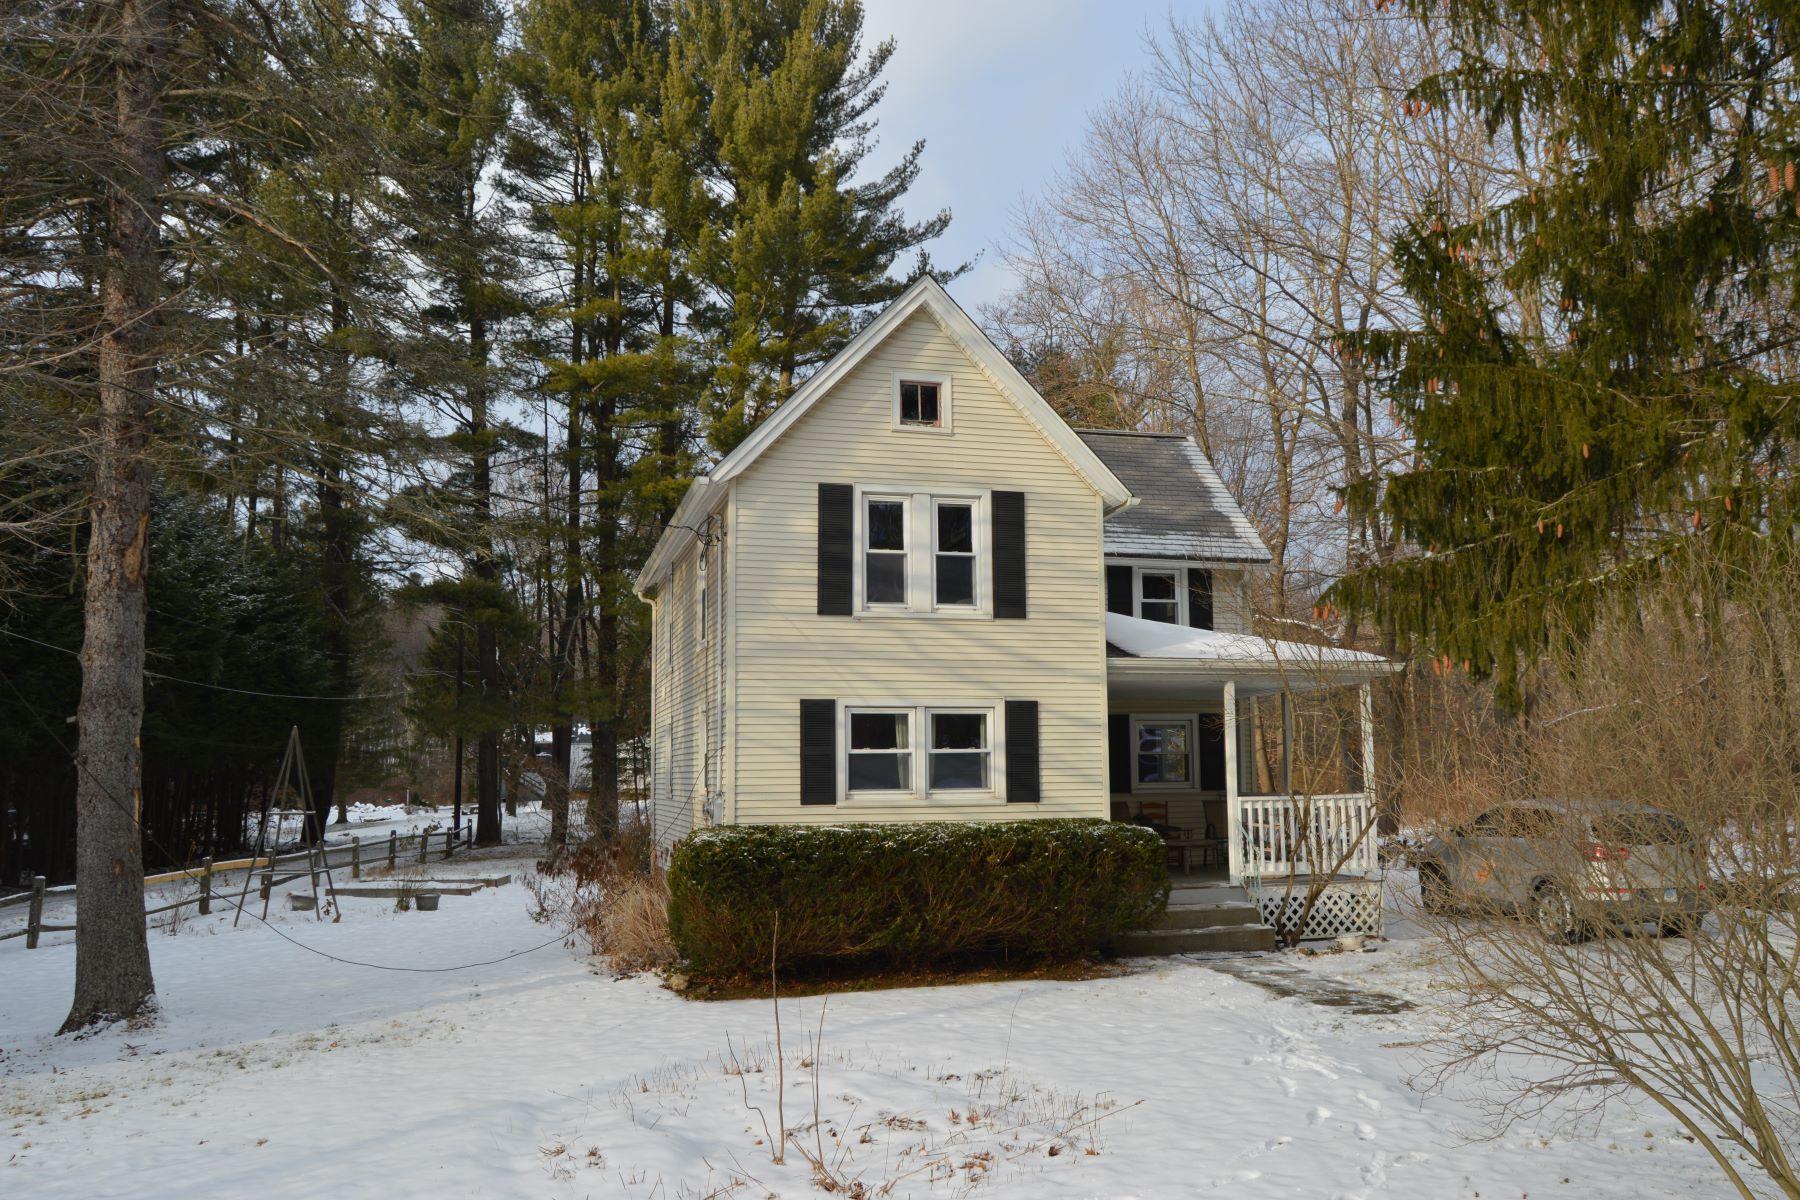 独户住宅 为 销售 在 Charming Bantam Village Colonial 1020 Bantam Road, 利奇菲尔德, 康涅狄格州, 06750 美国